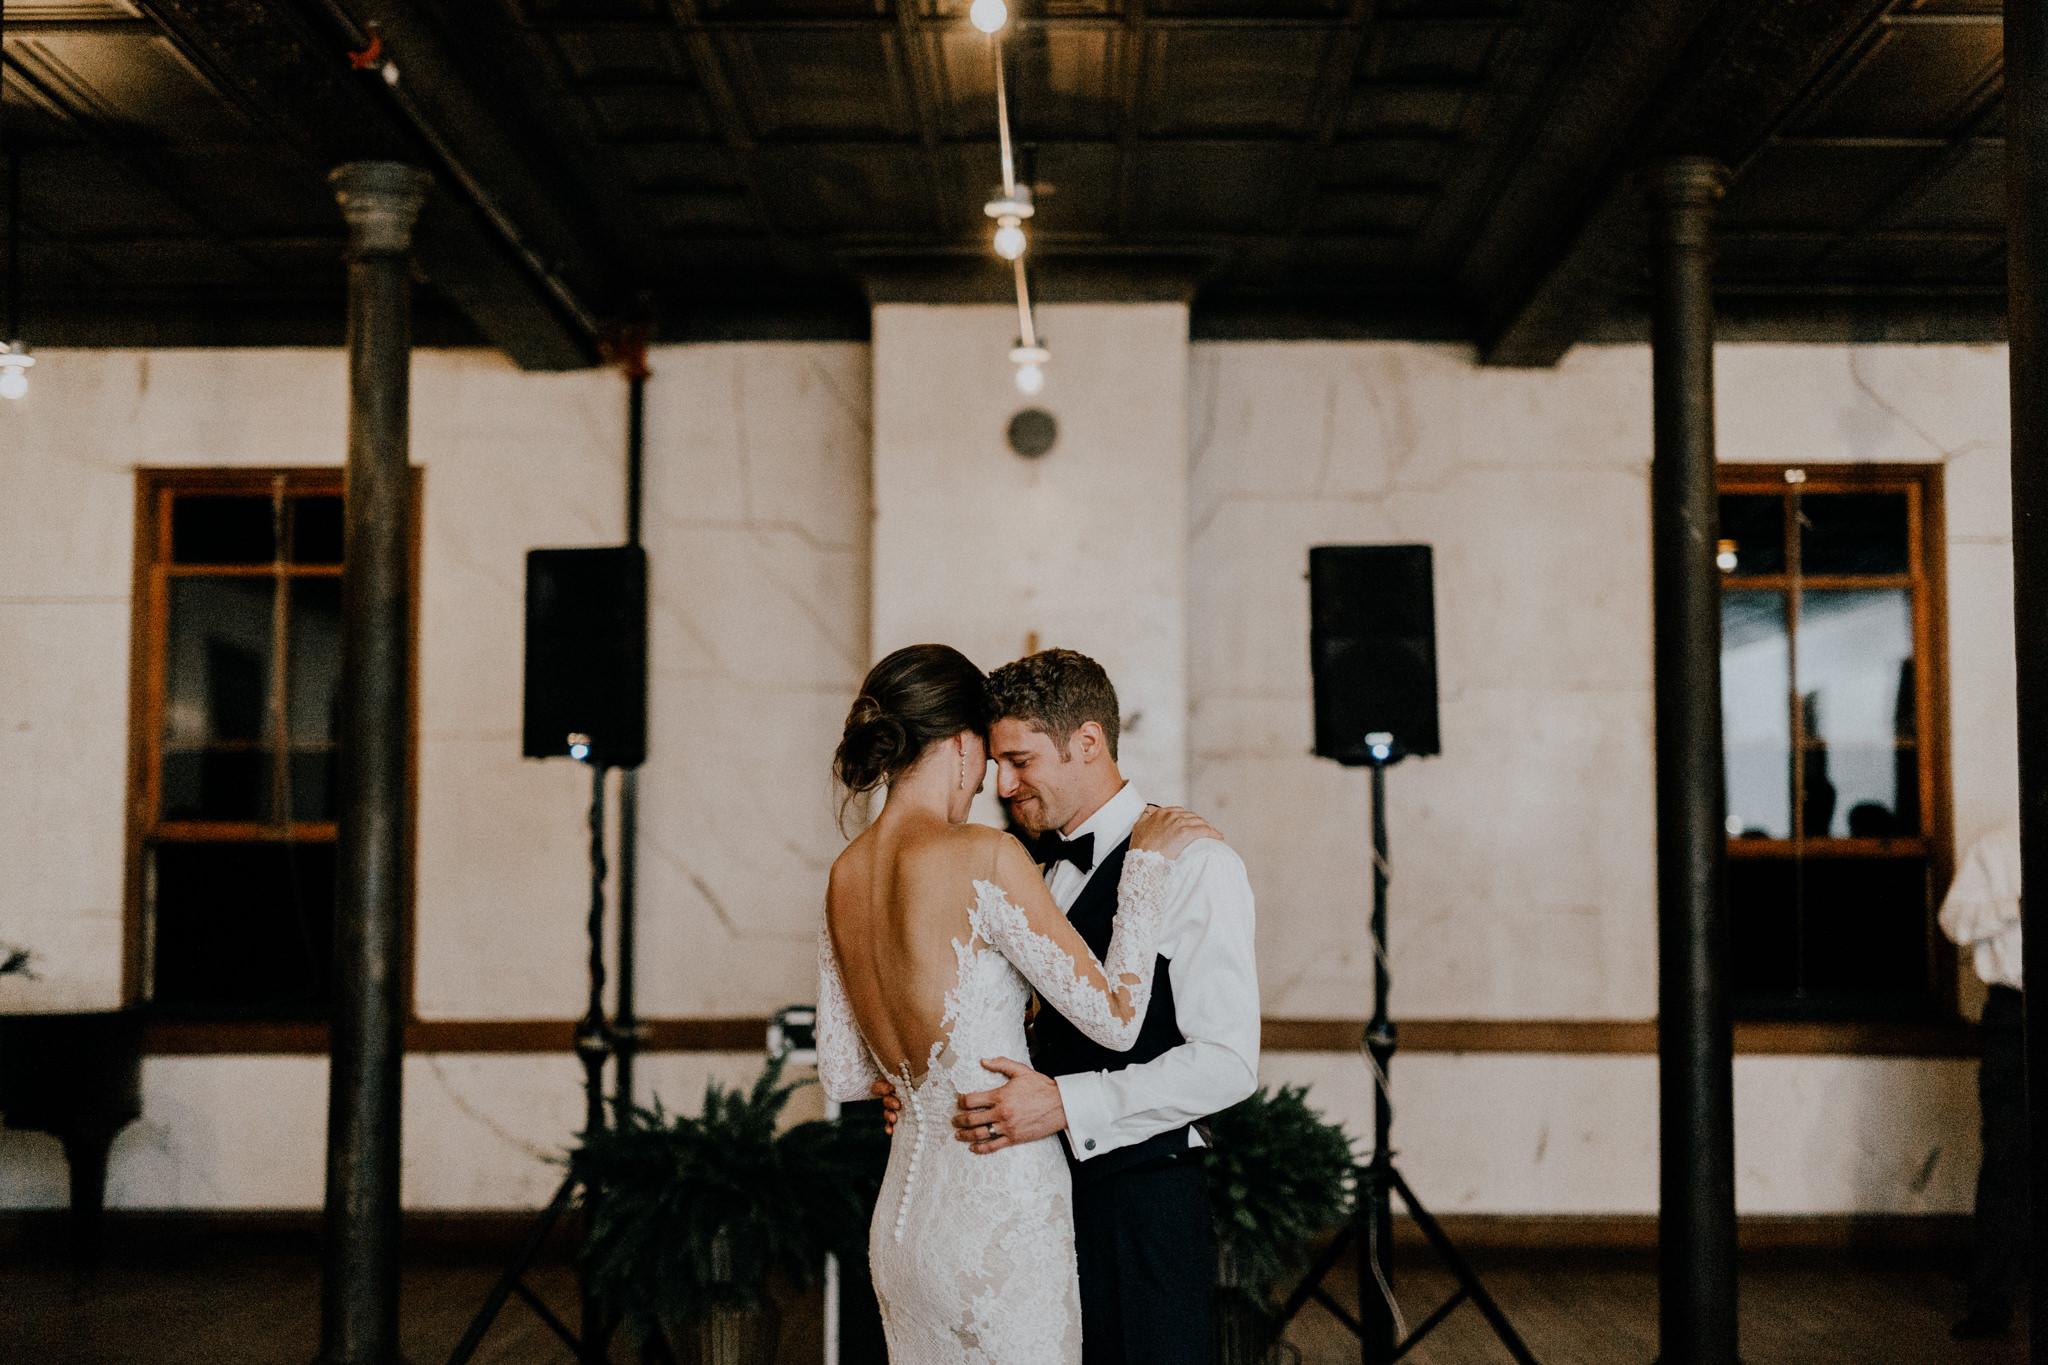 wedding-headlands-center-for-the-arts-sausalito-138.jpg